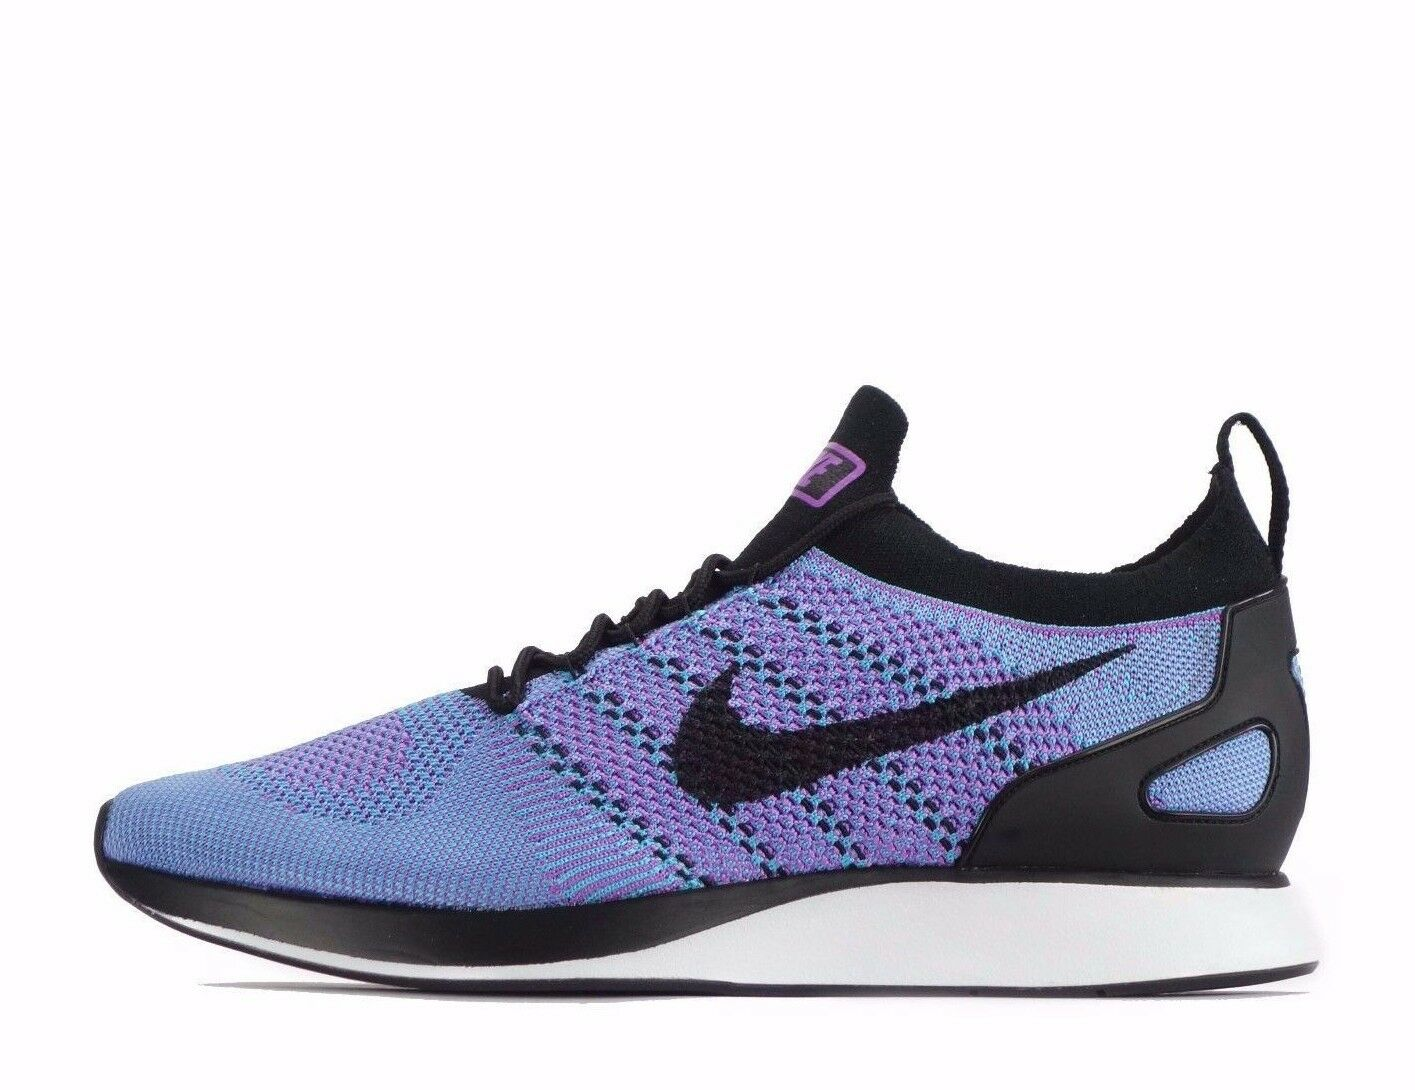 Nike uns air zoom mariah flyknit racer  10,5 uns Nike schwarze schuhe a5a9b4